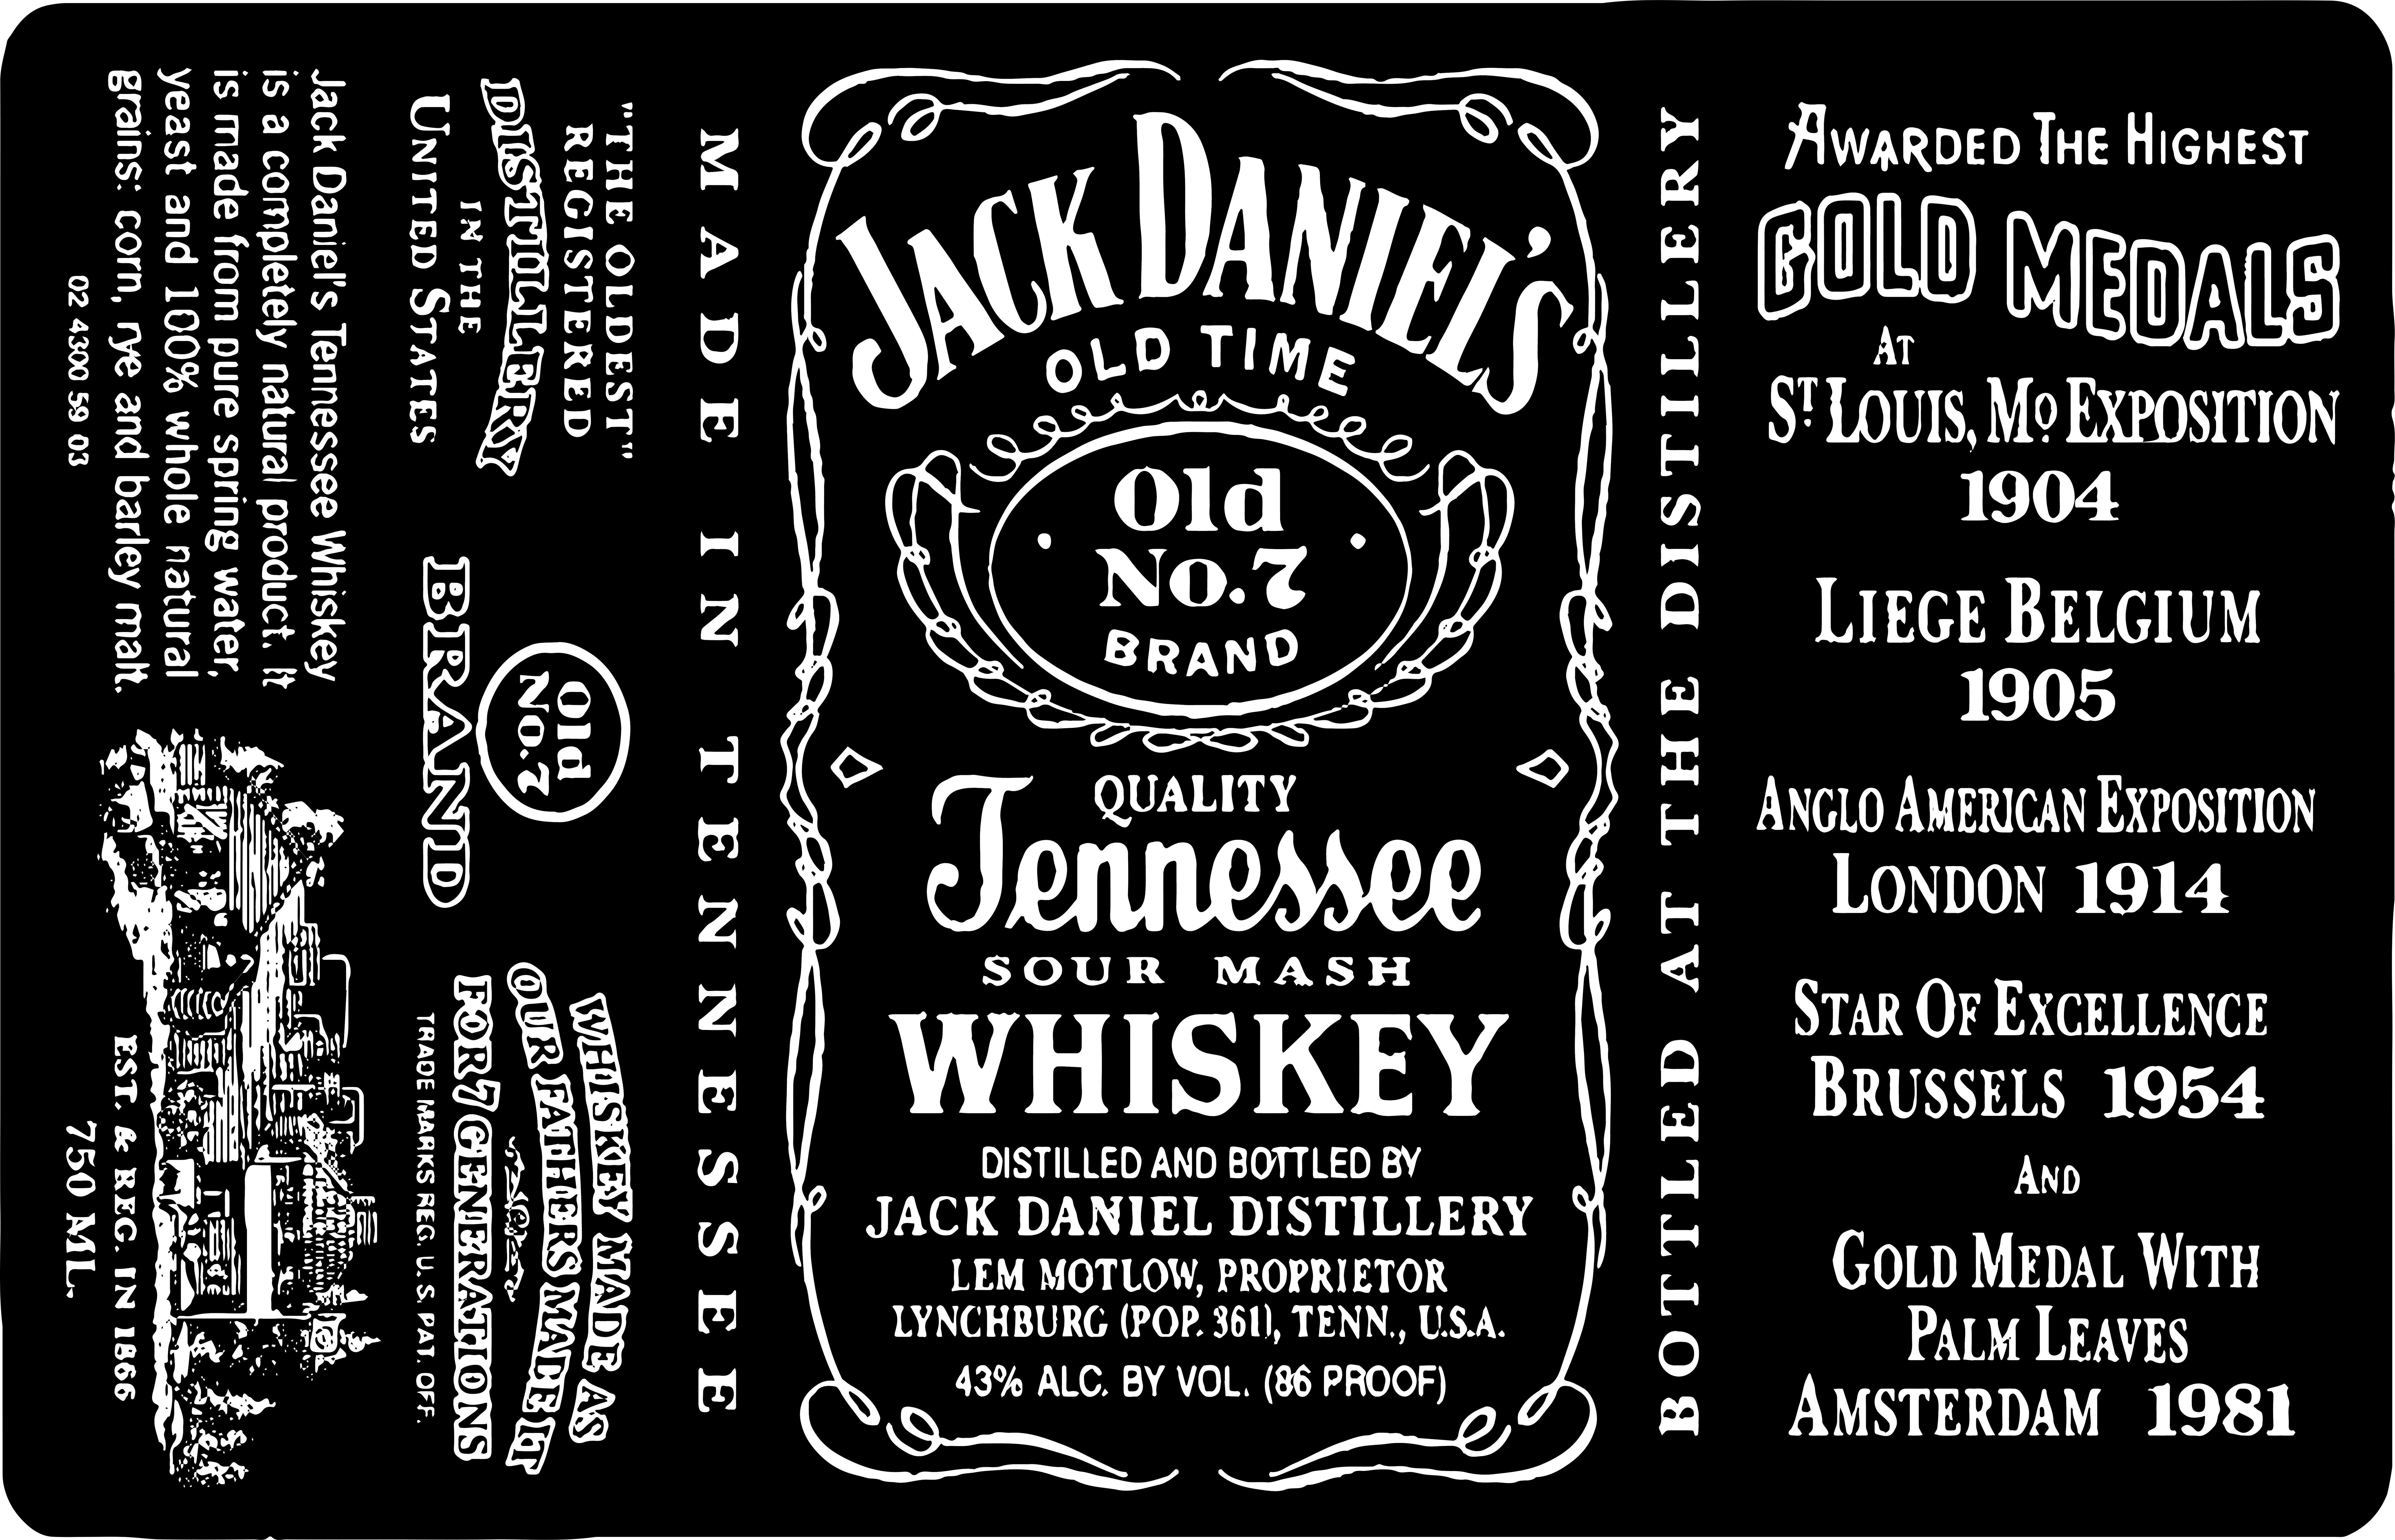 New Blank Jack Daniels Label With Blank Jack Daniels Label Template